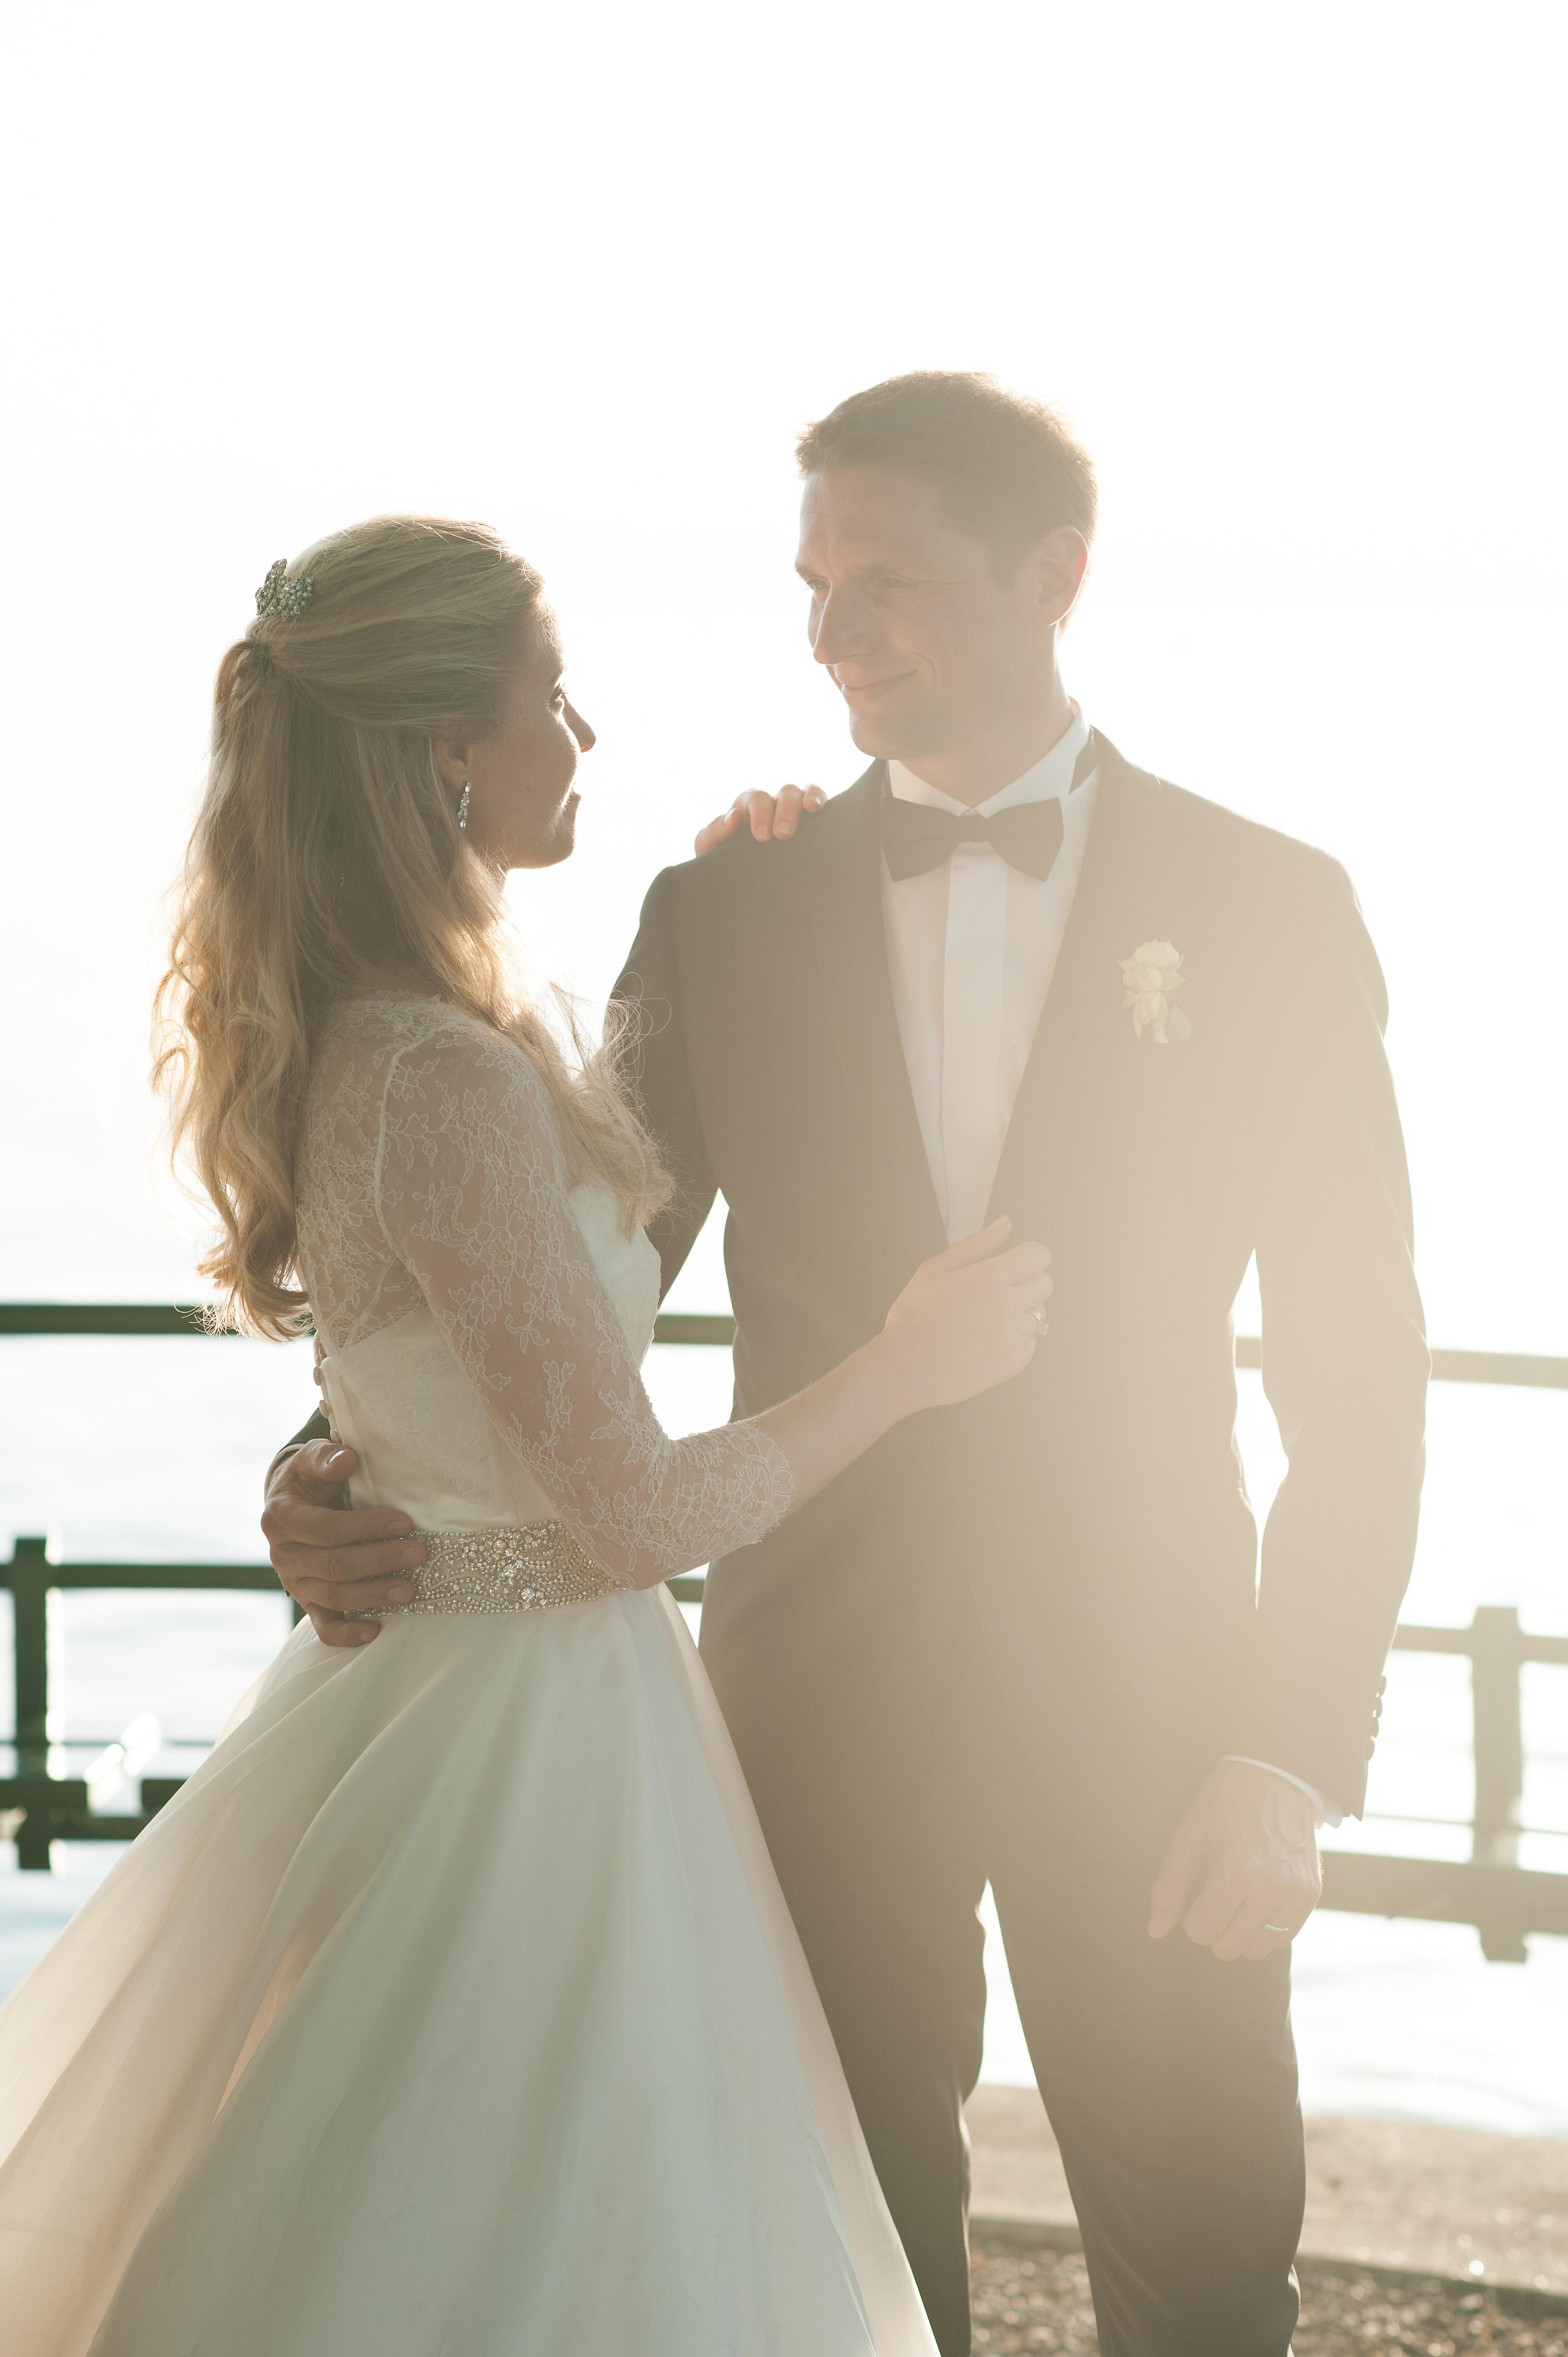 Samantha andreas 330 belle en blanc robe de mari e for Belle jardin blanc de blancs